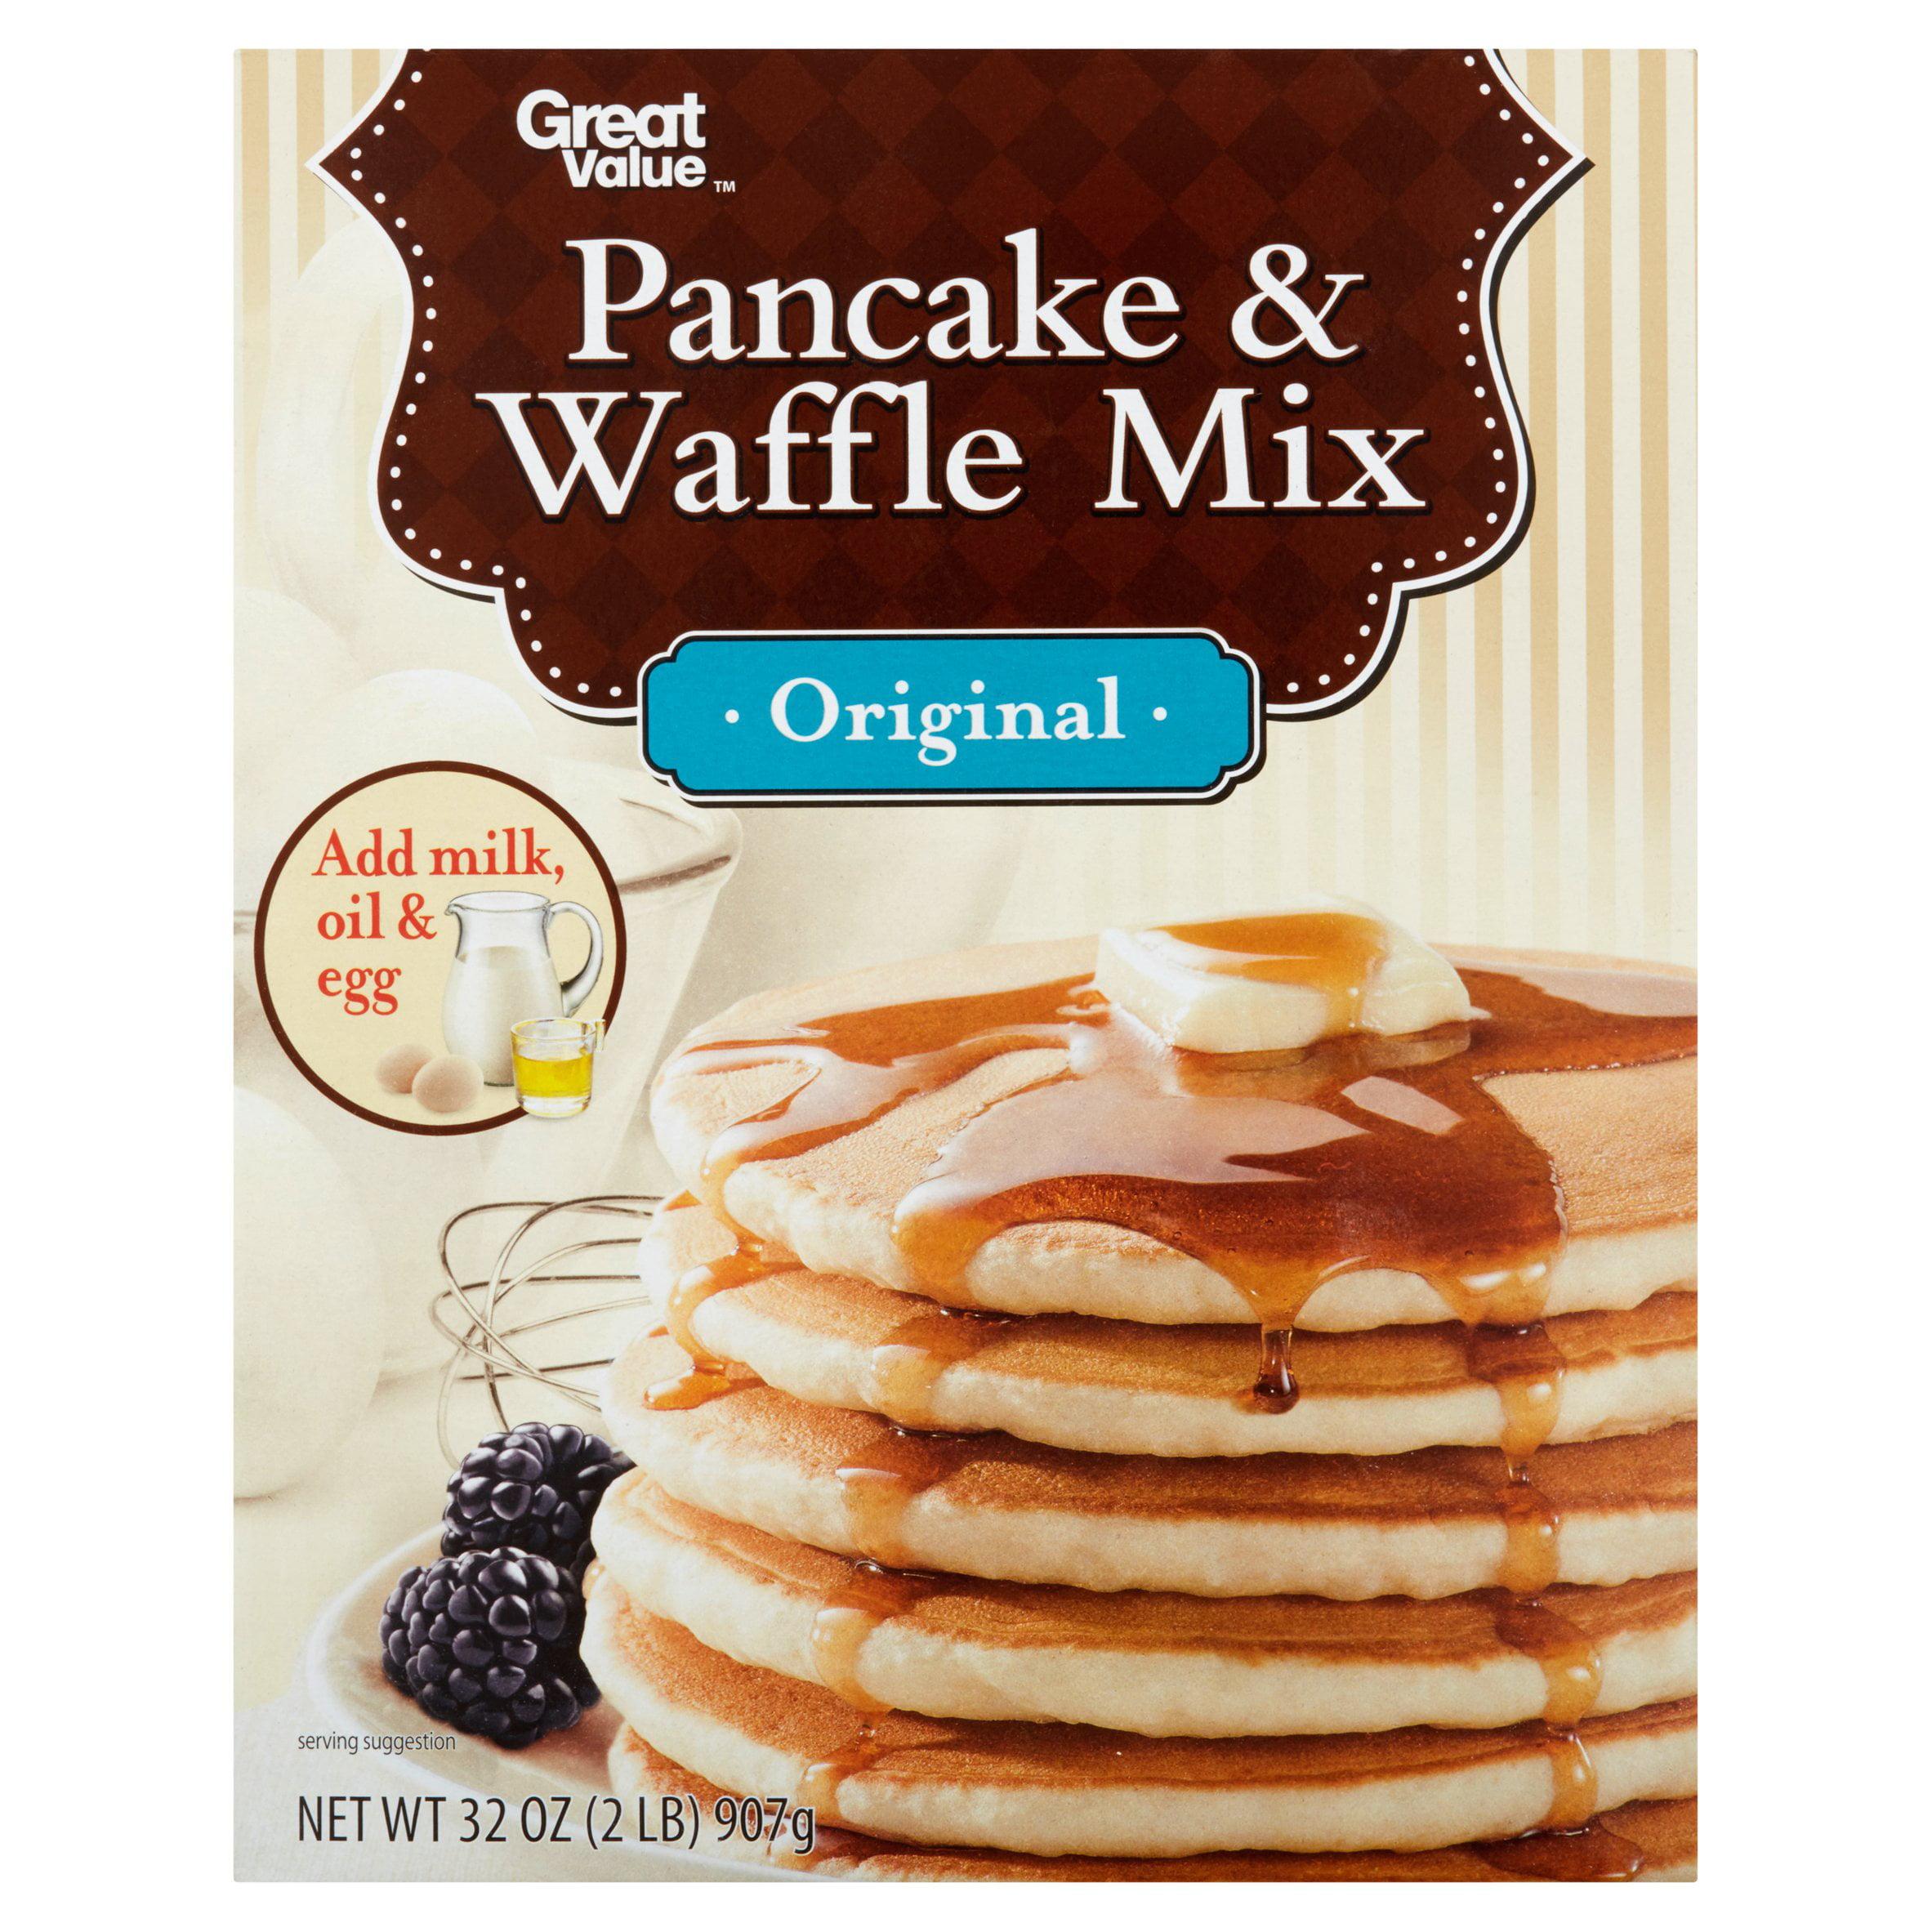 Great Value Original Pancake & Waffle Mix, 32 oz by Wal-Mart Stores, Inc.